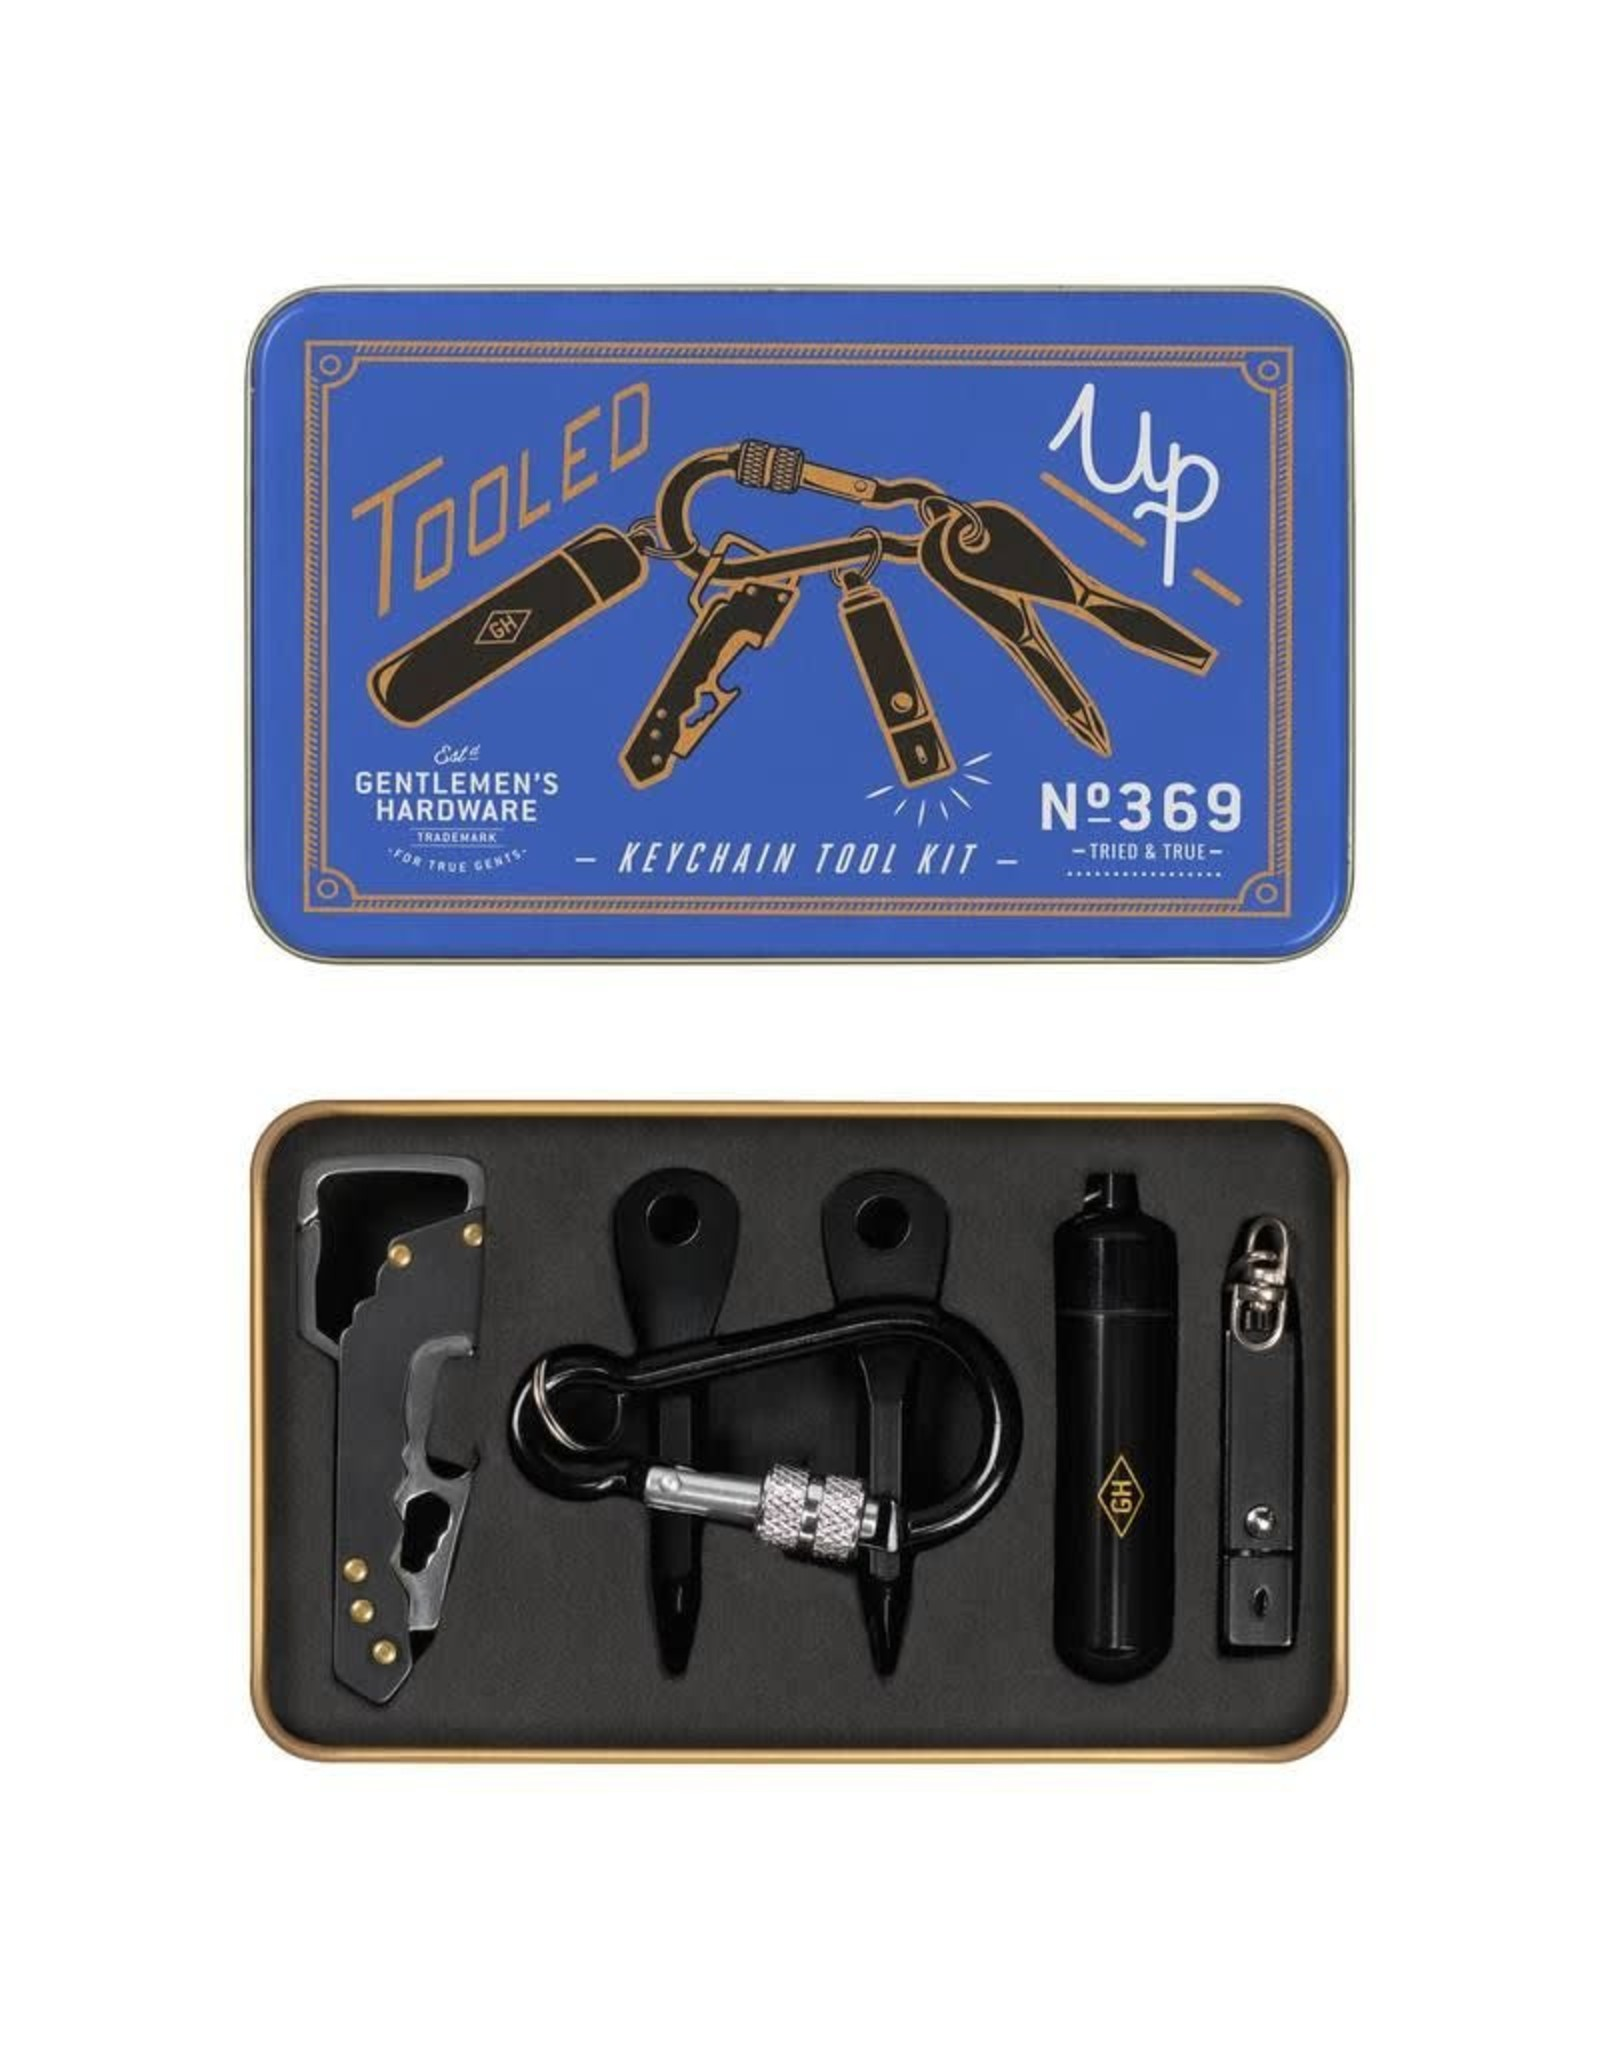 Gentlemen's Hardware Everyday Key chain Kit